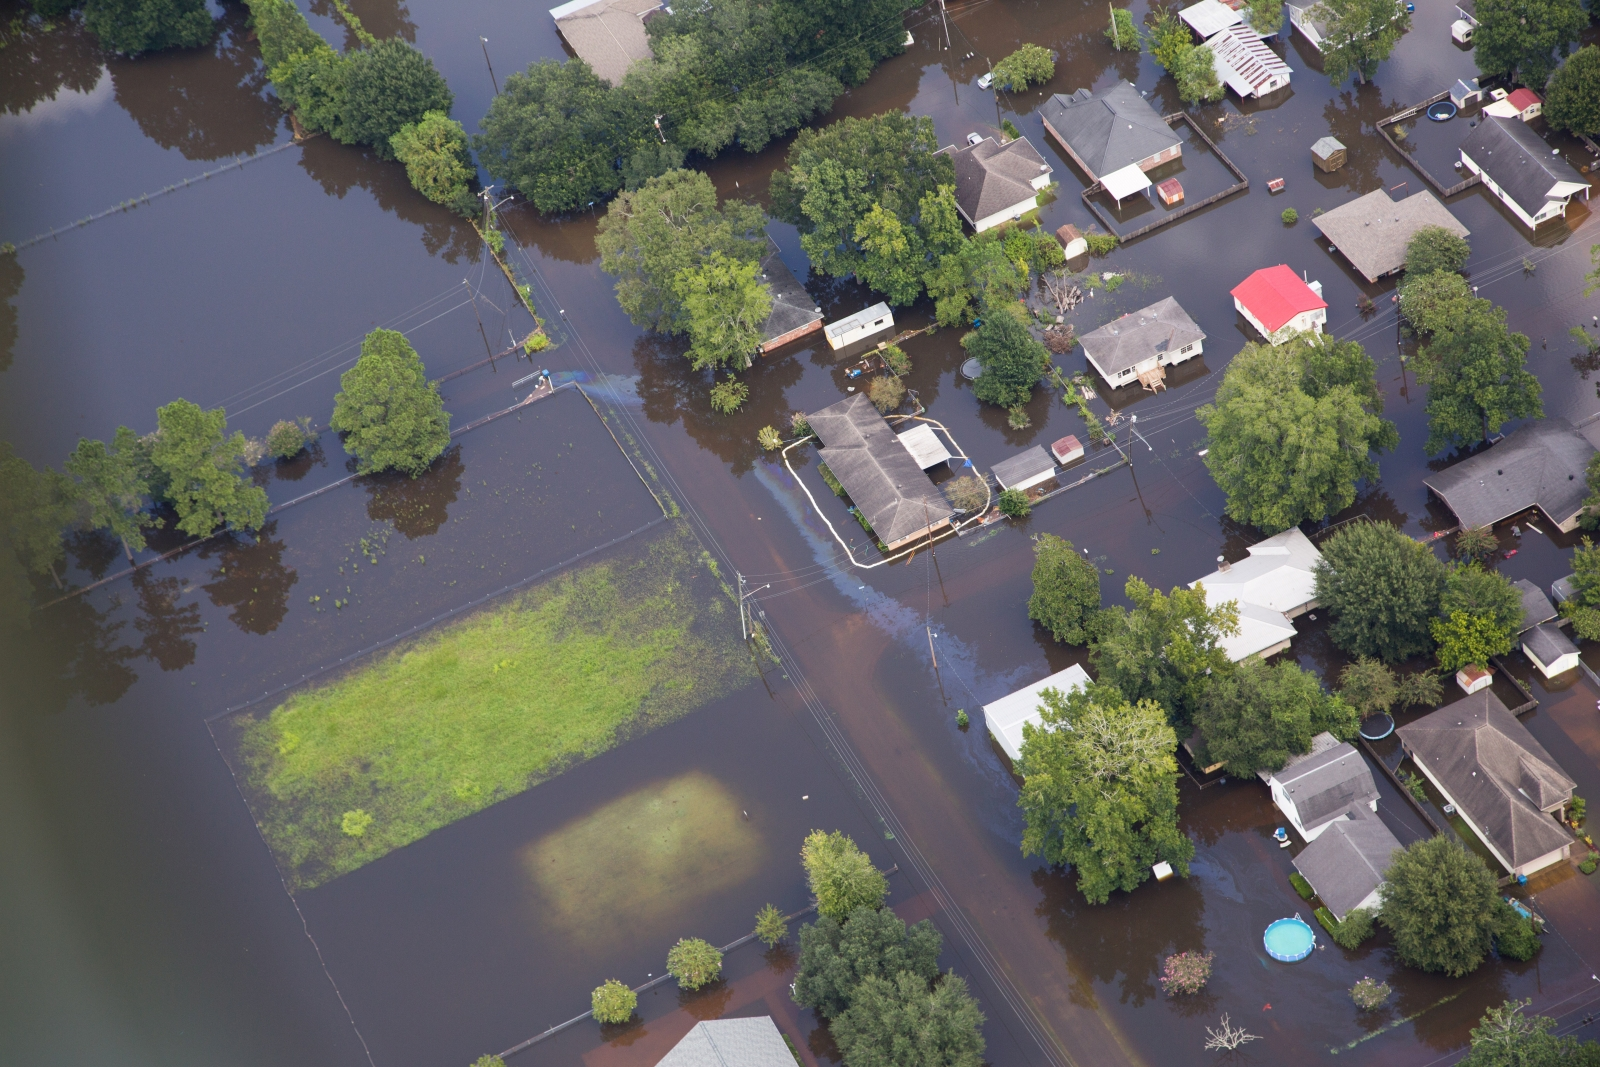 Louisiana flooding: President Obama to visit Baton Rouge